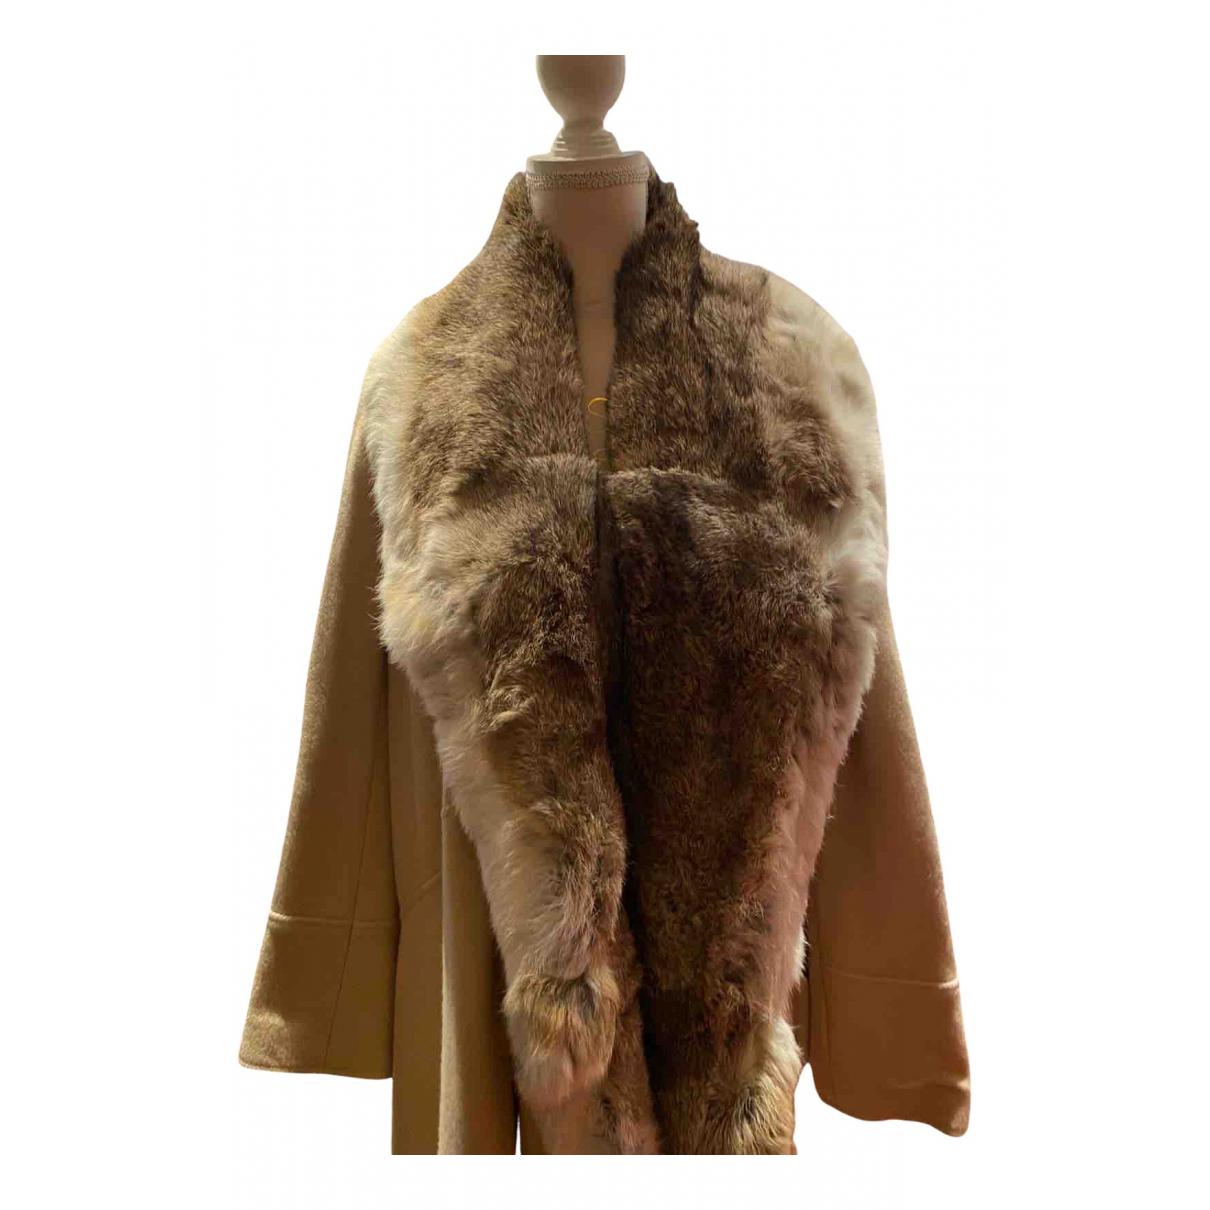 Parosh \N Beige coat for Women S International